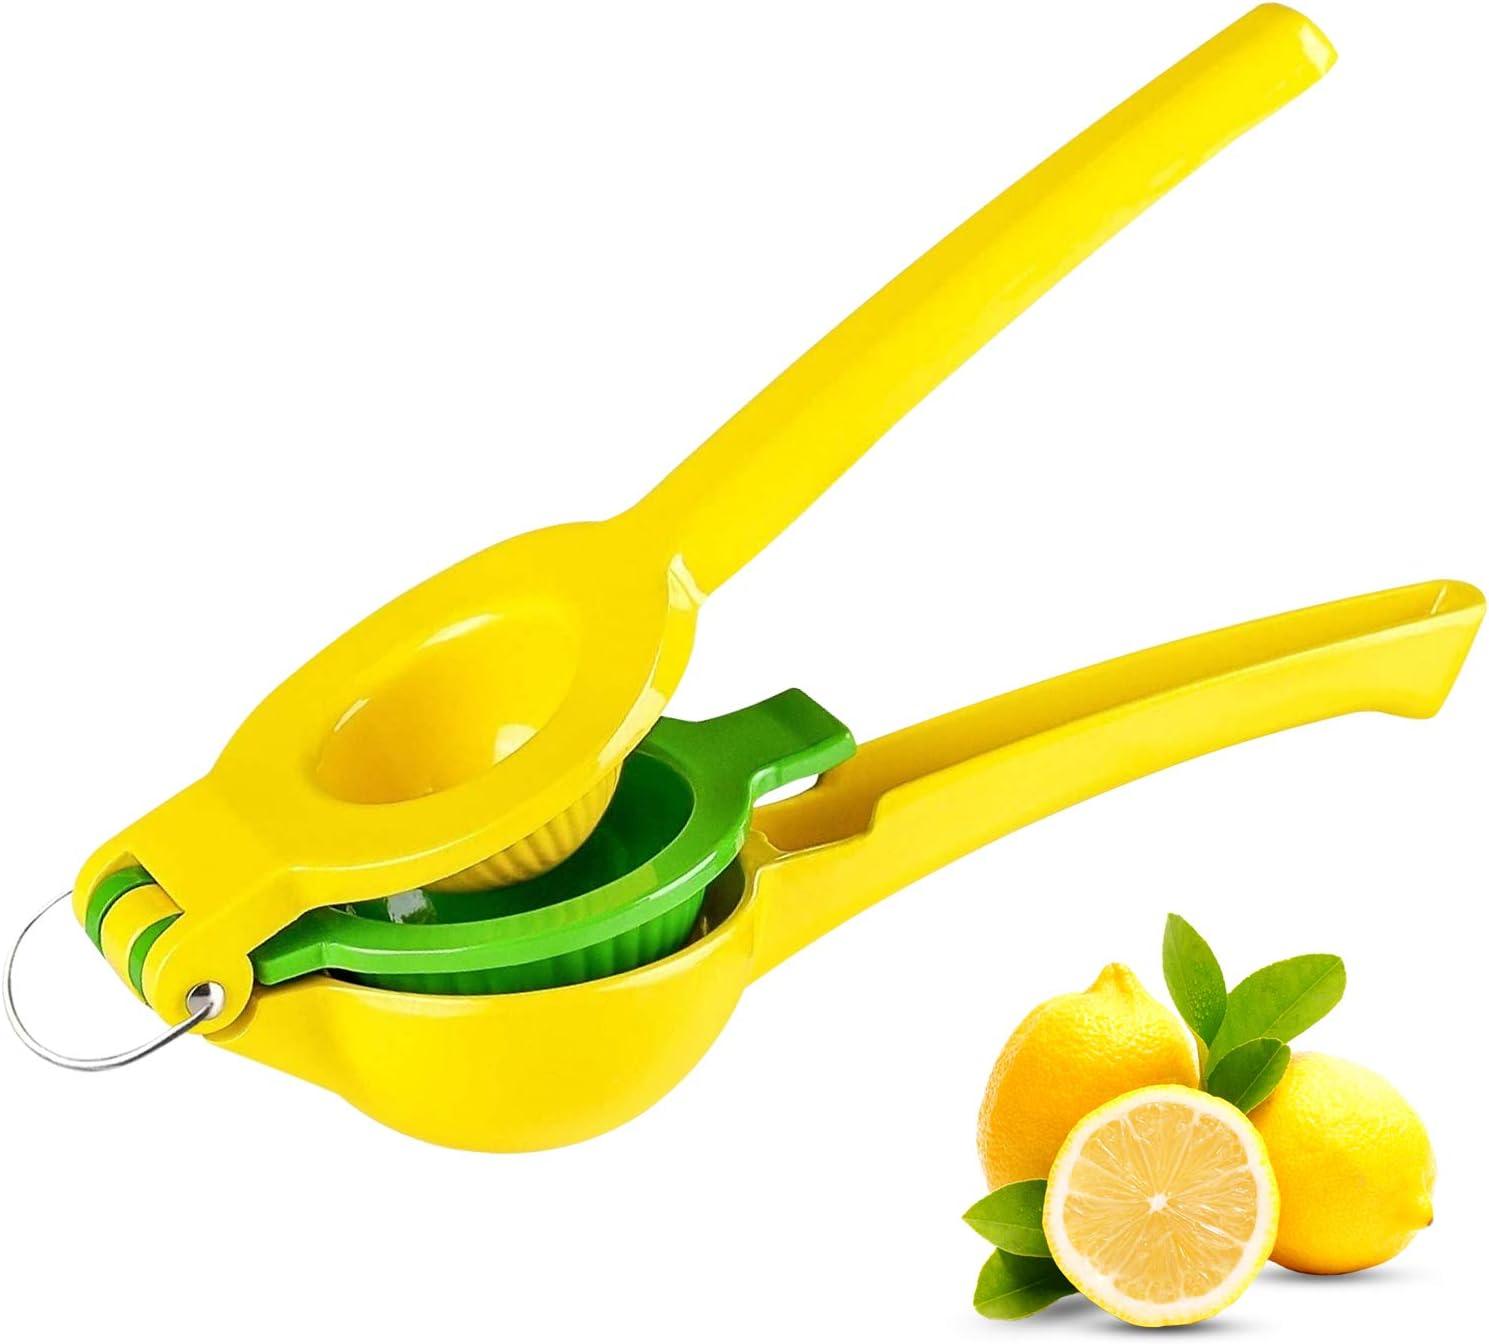 Lemon Squeezer Manual Citrus Juicer - Fruit Juicer Hand Press Lime Squeezer, Professional Citrus Juicer Kitchen Tools, Quality Lime Handheld Press for Lemonade, Party Drink Cocktail